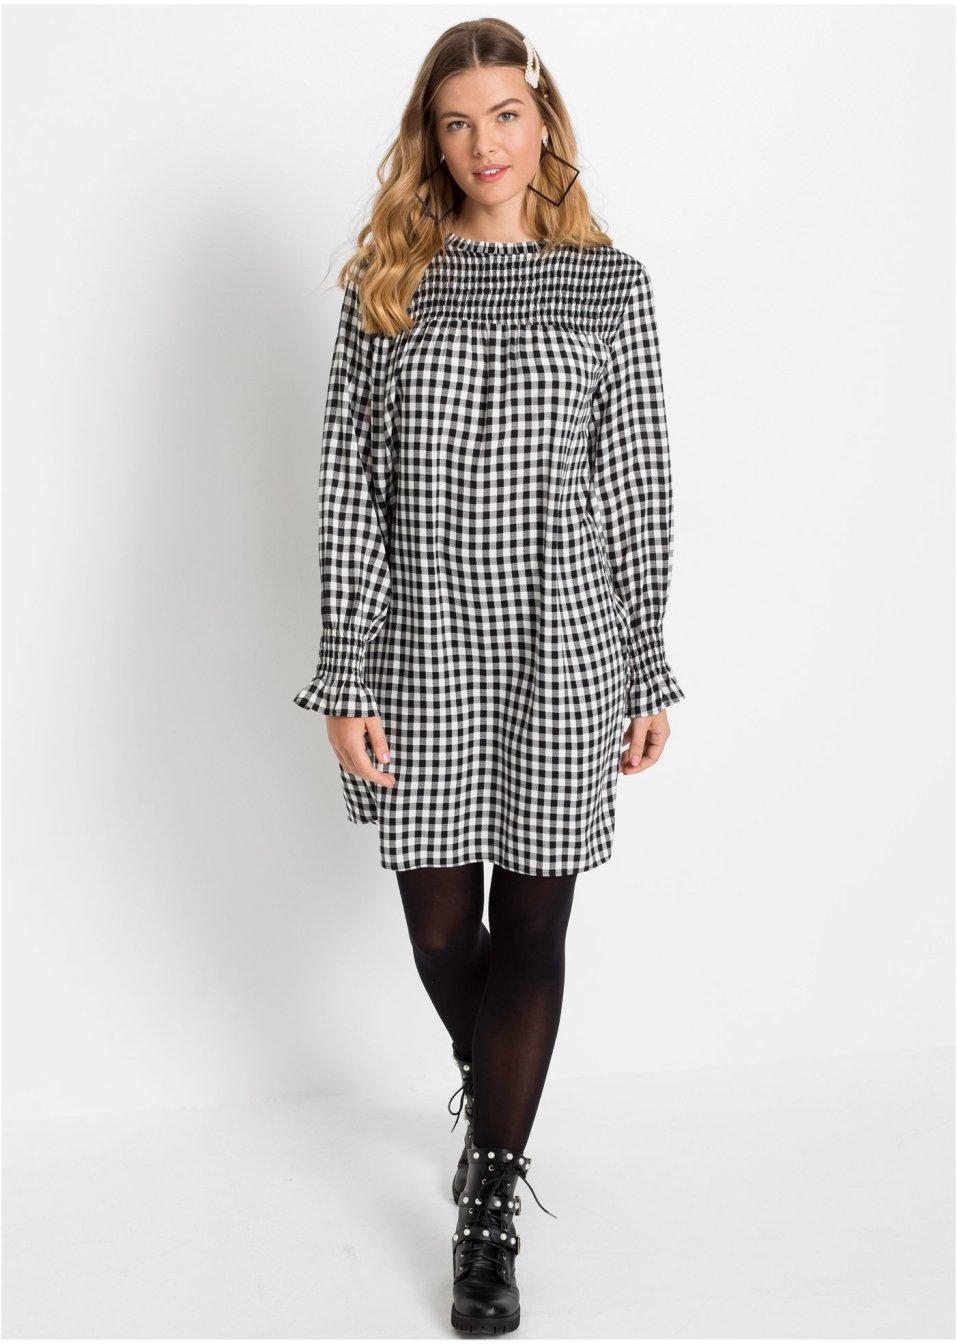 Kleid schwarz/weiß kariert - Damen - bonprix.de